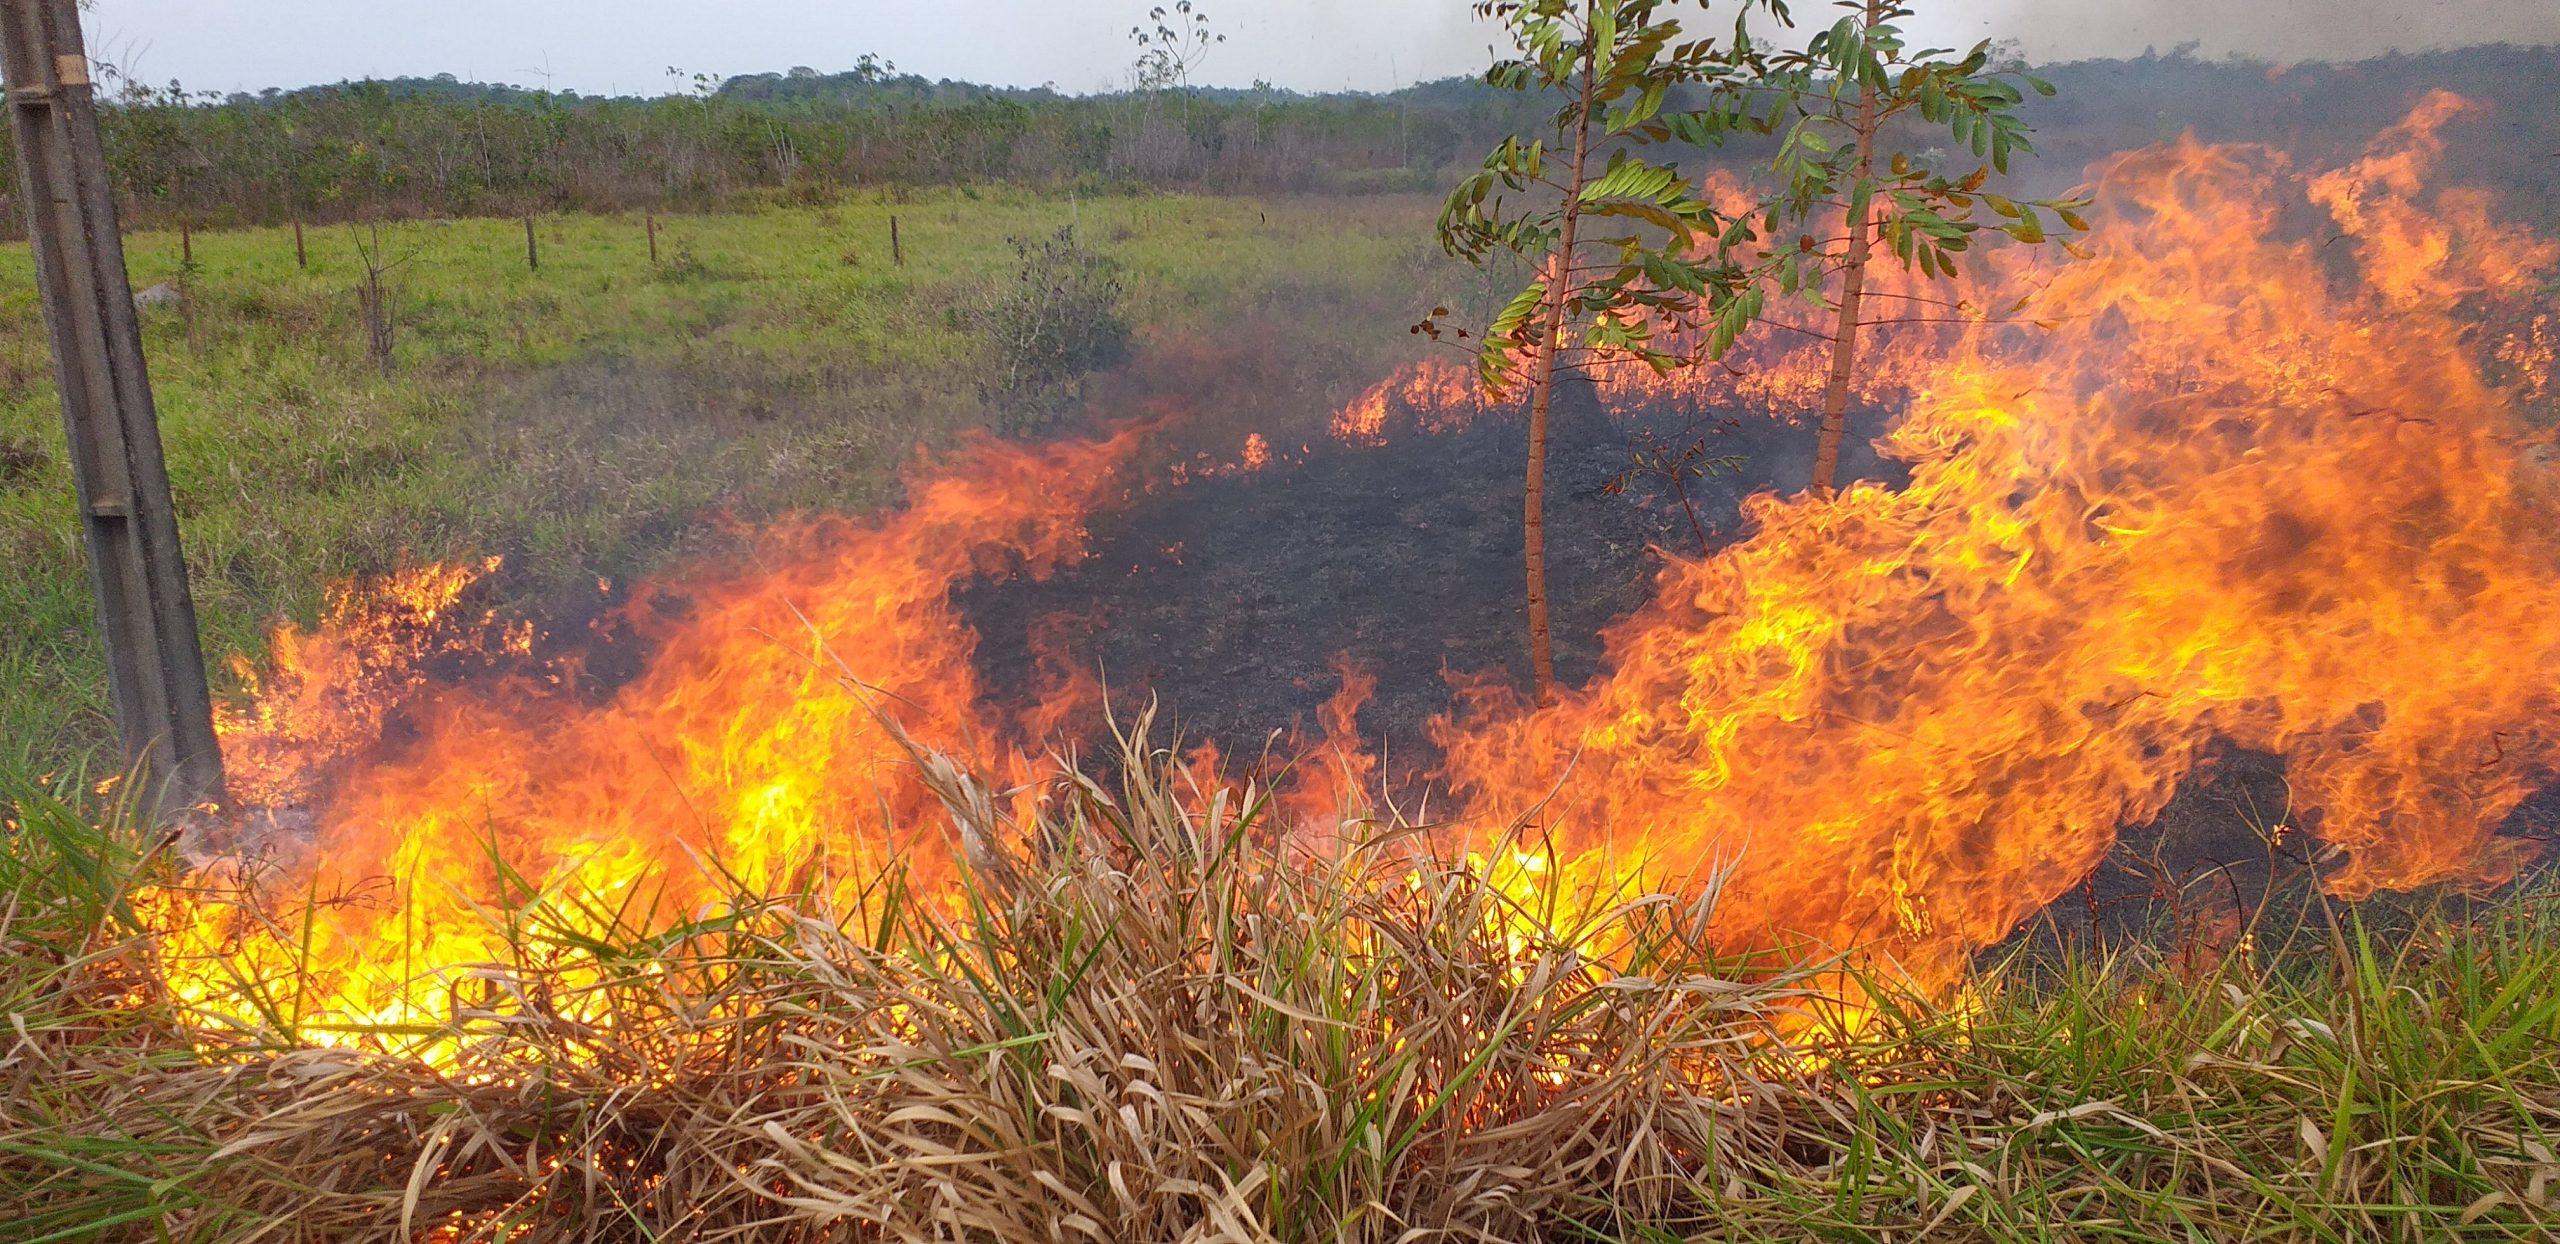 Incendio Amazonia